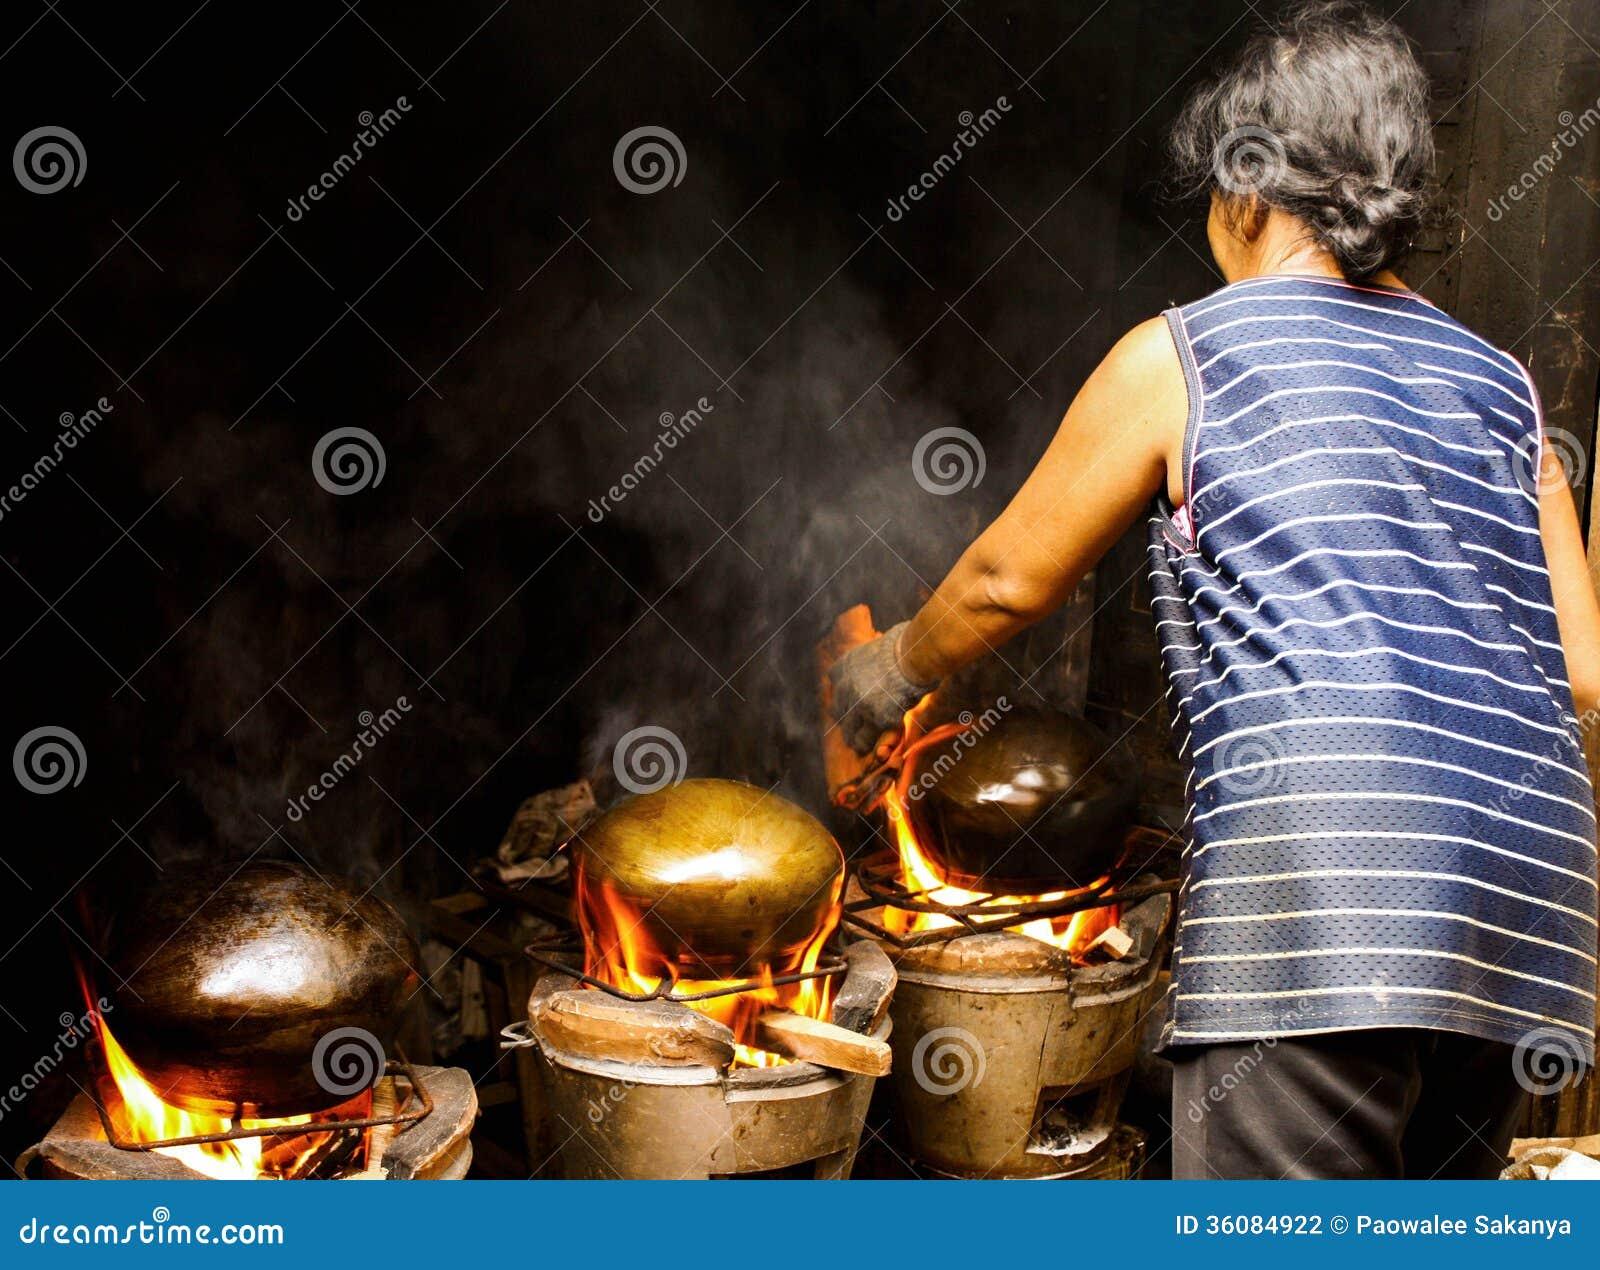 Ban Baat Community Editorial Photography - Image: 36084922